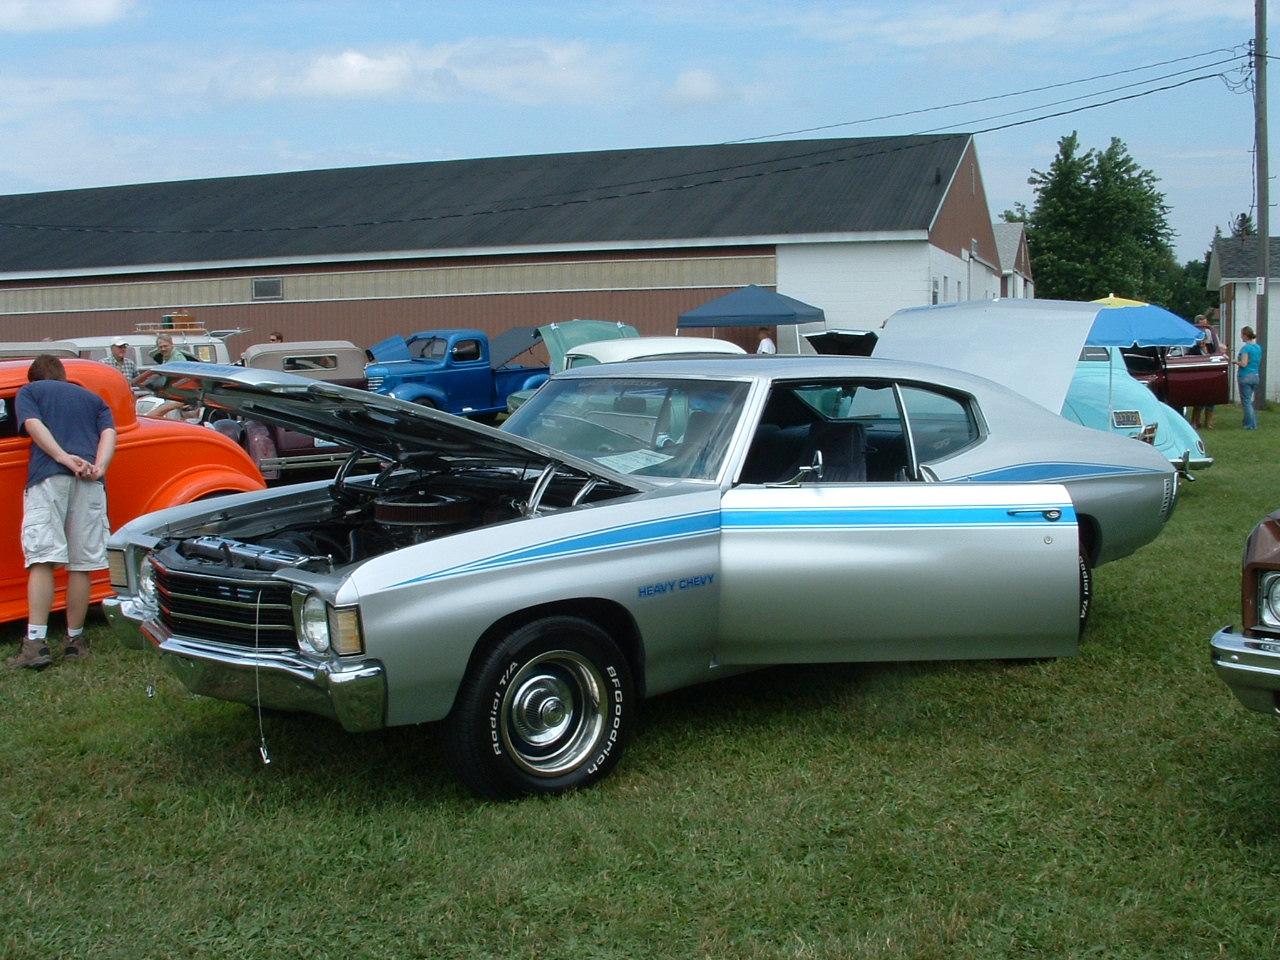 1972 Chevy Chevelle 383